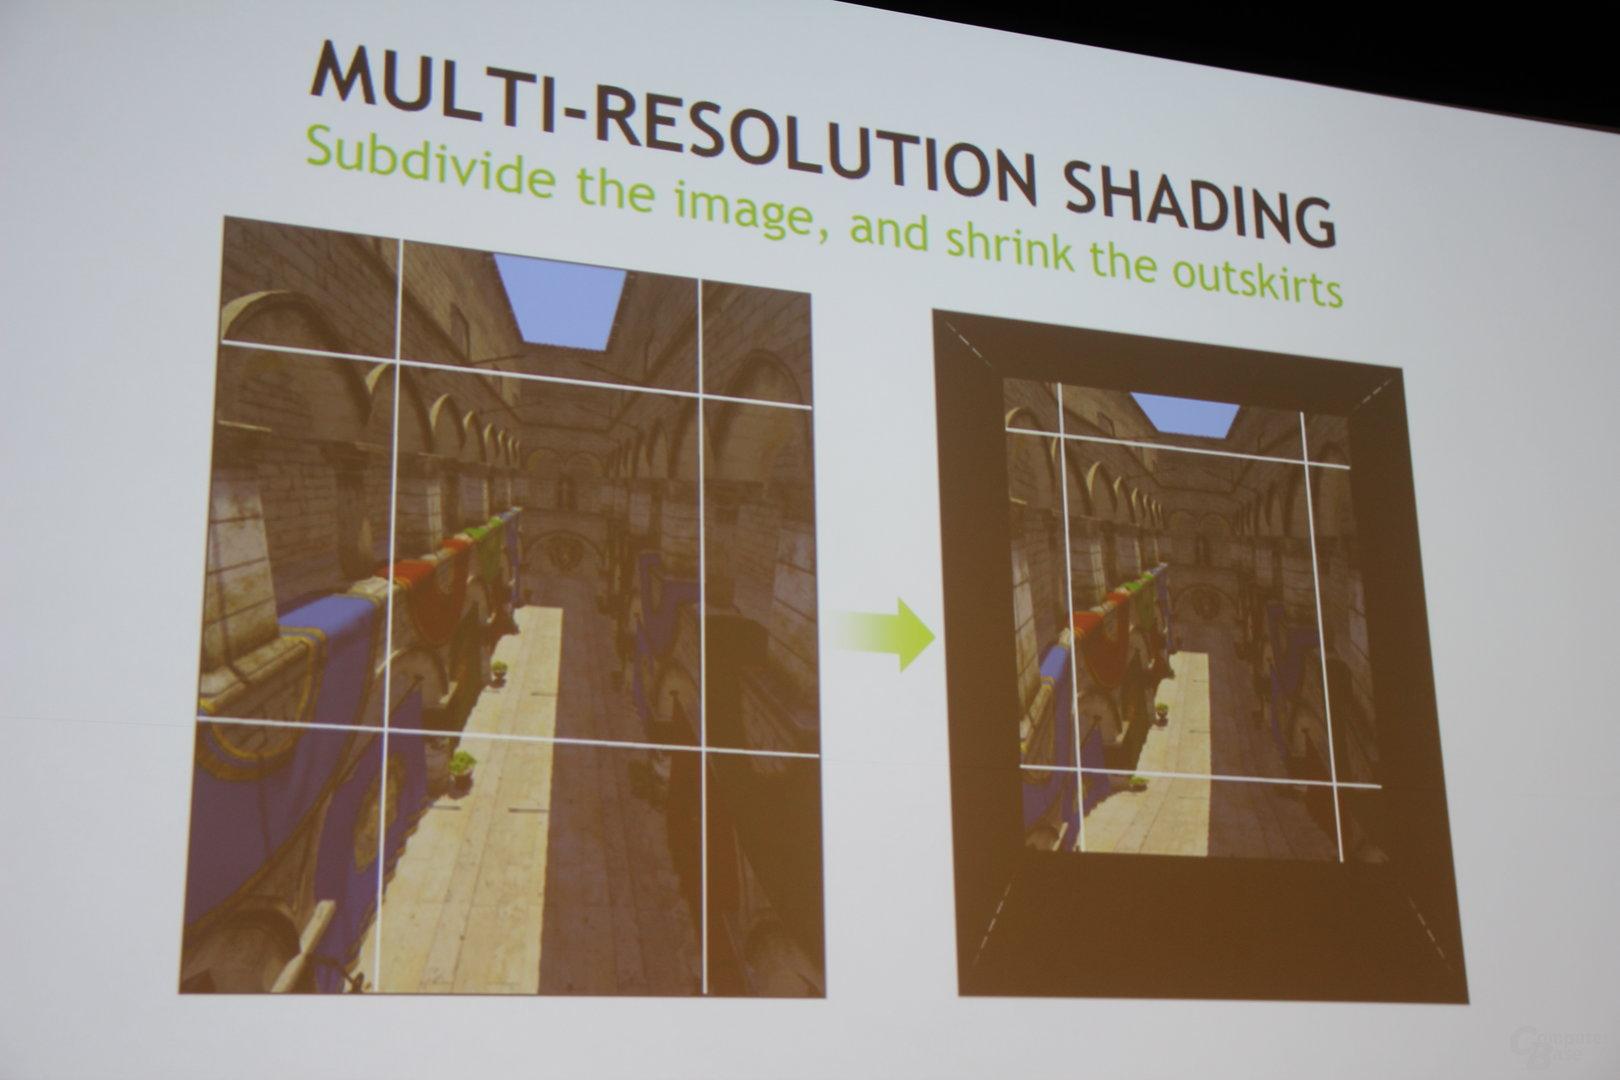 Multi-Res Shading